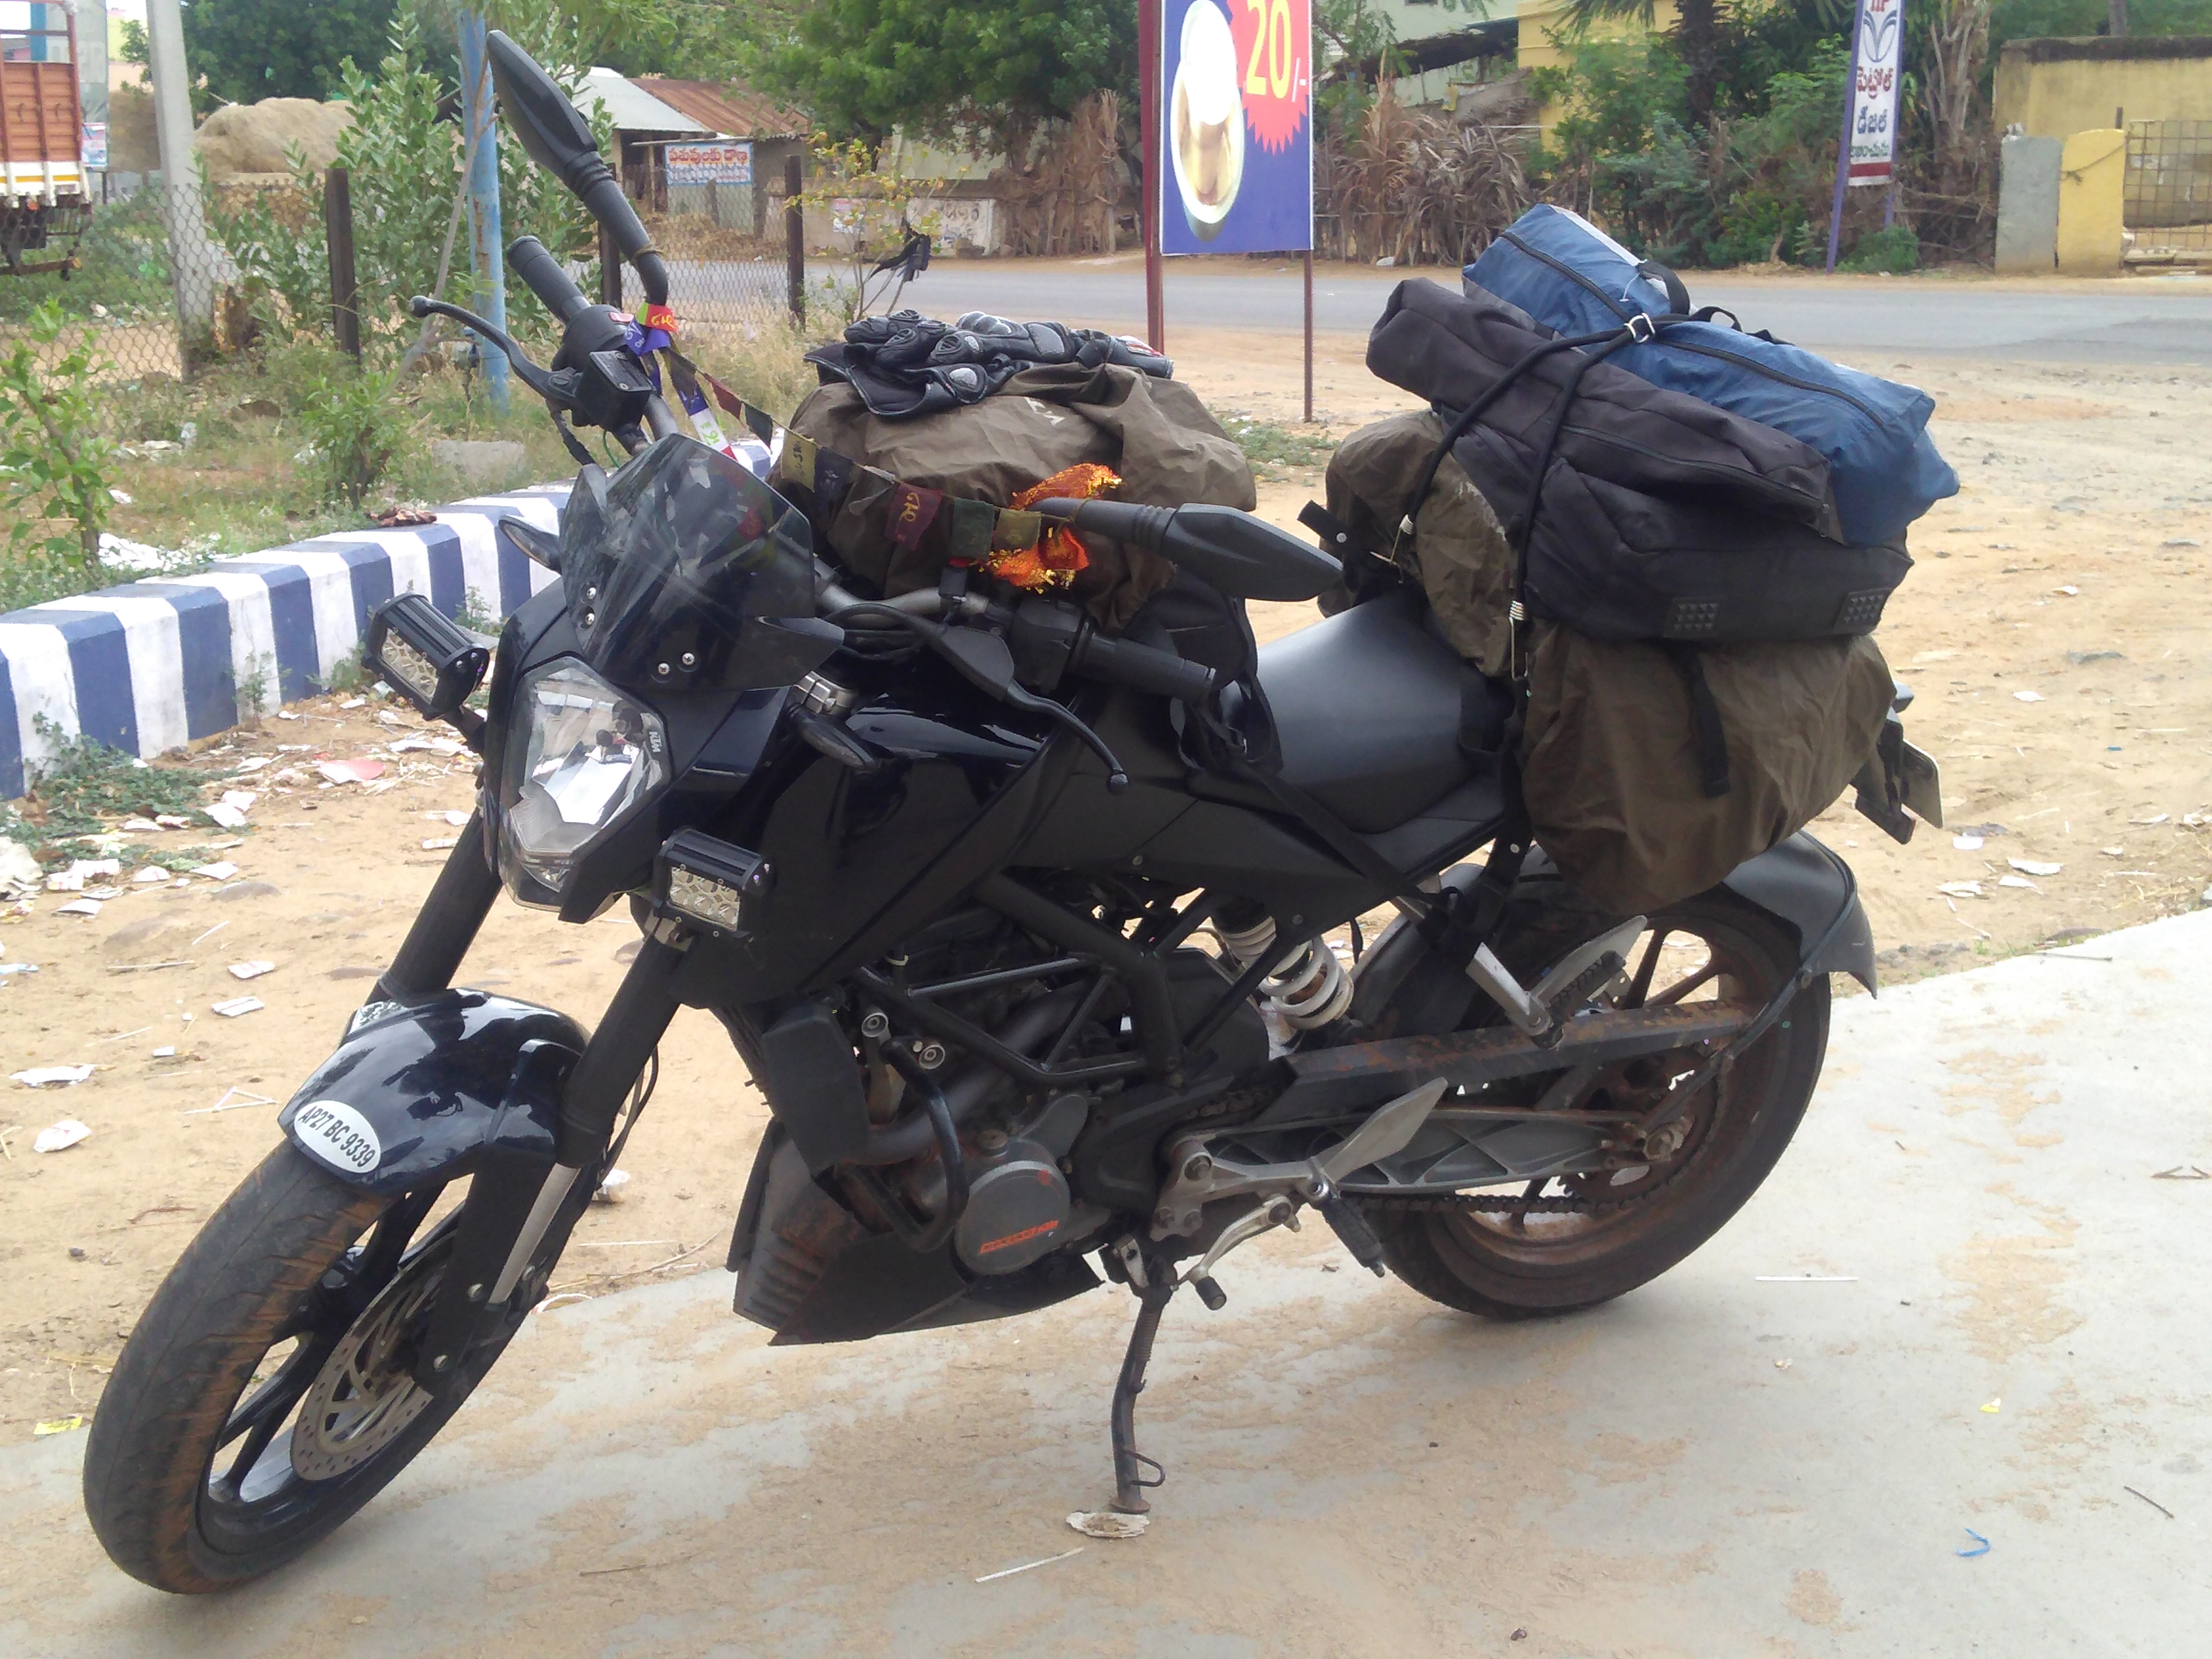 Ride Image by Sai charan Thej